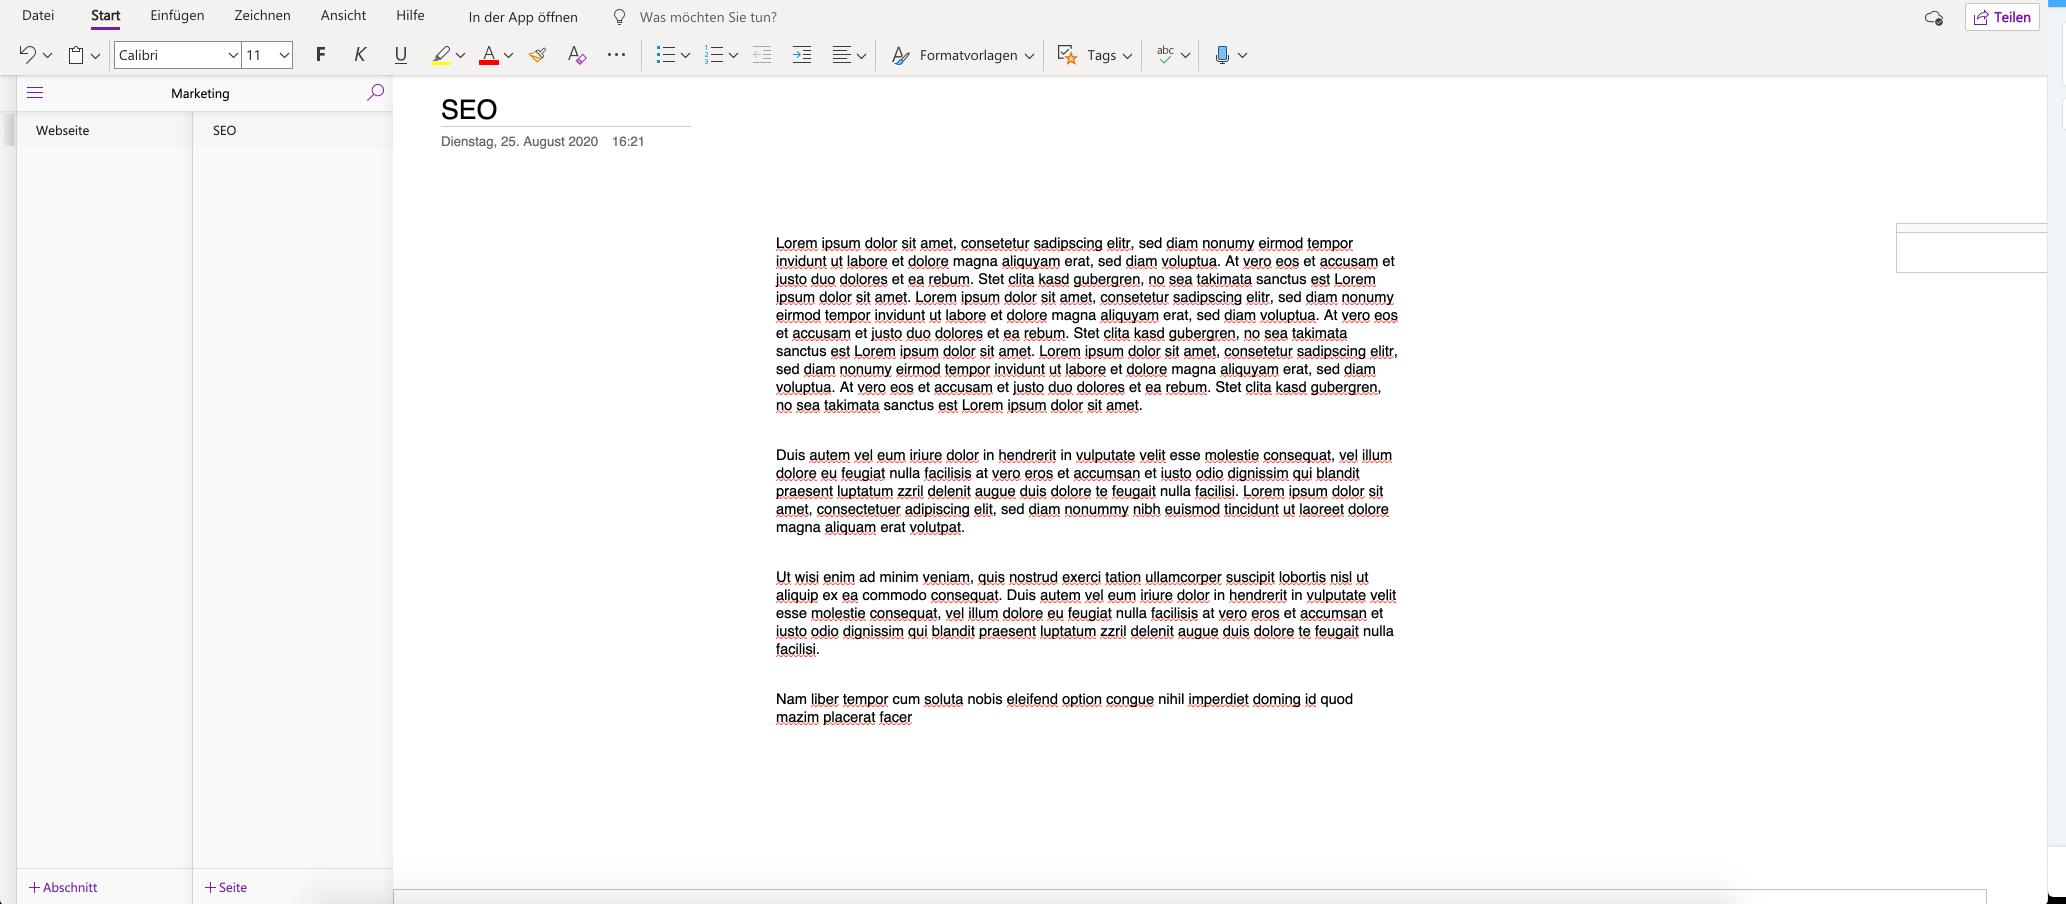 Ein Screenshot des Tools Microsoft OneNote